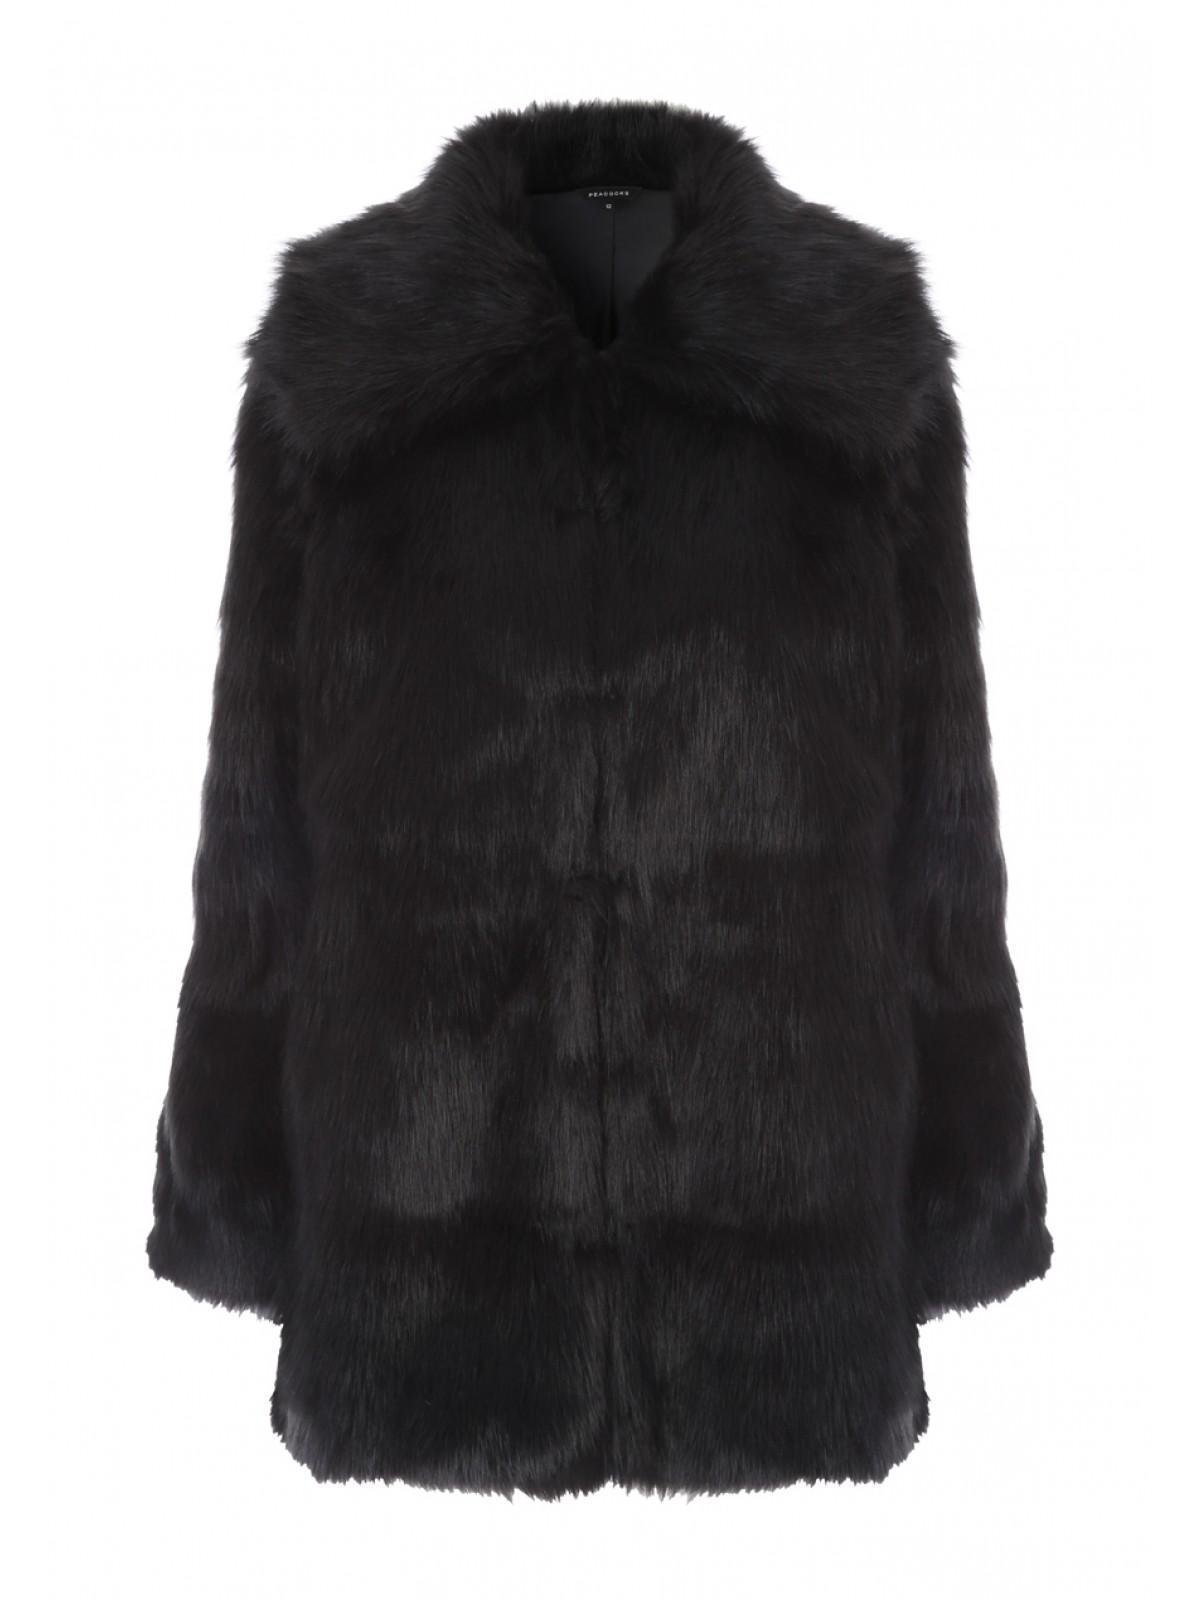 c9dc18d0a Home; Womens Black Faux Fur Coat. Back. PreviousNext